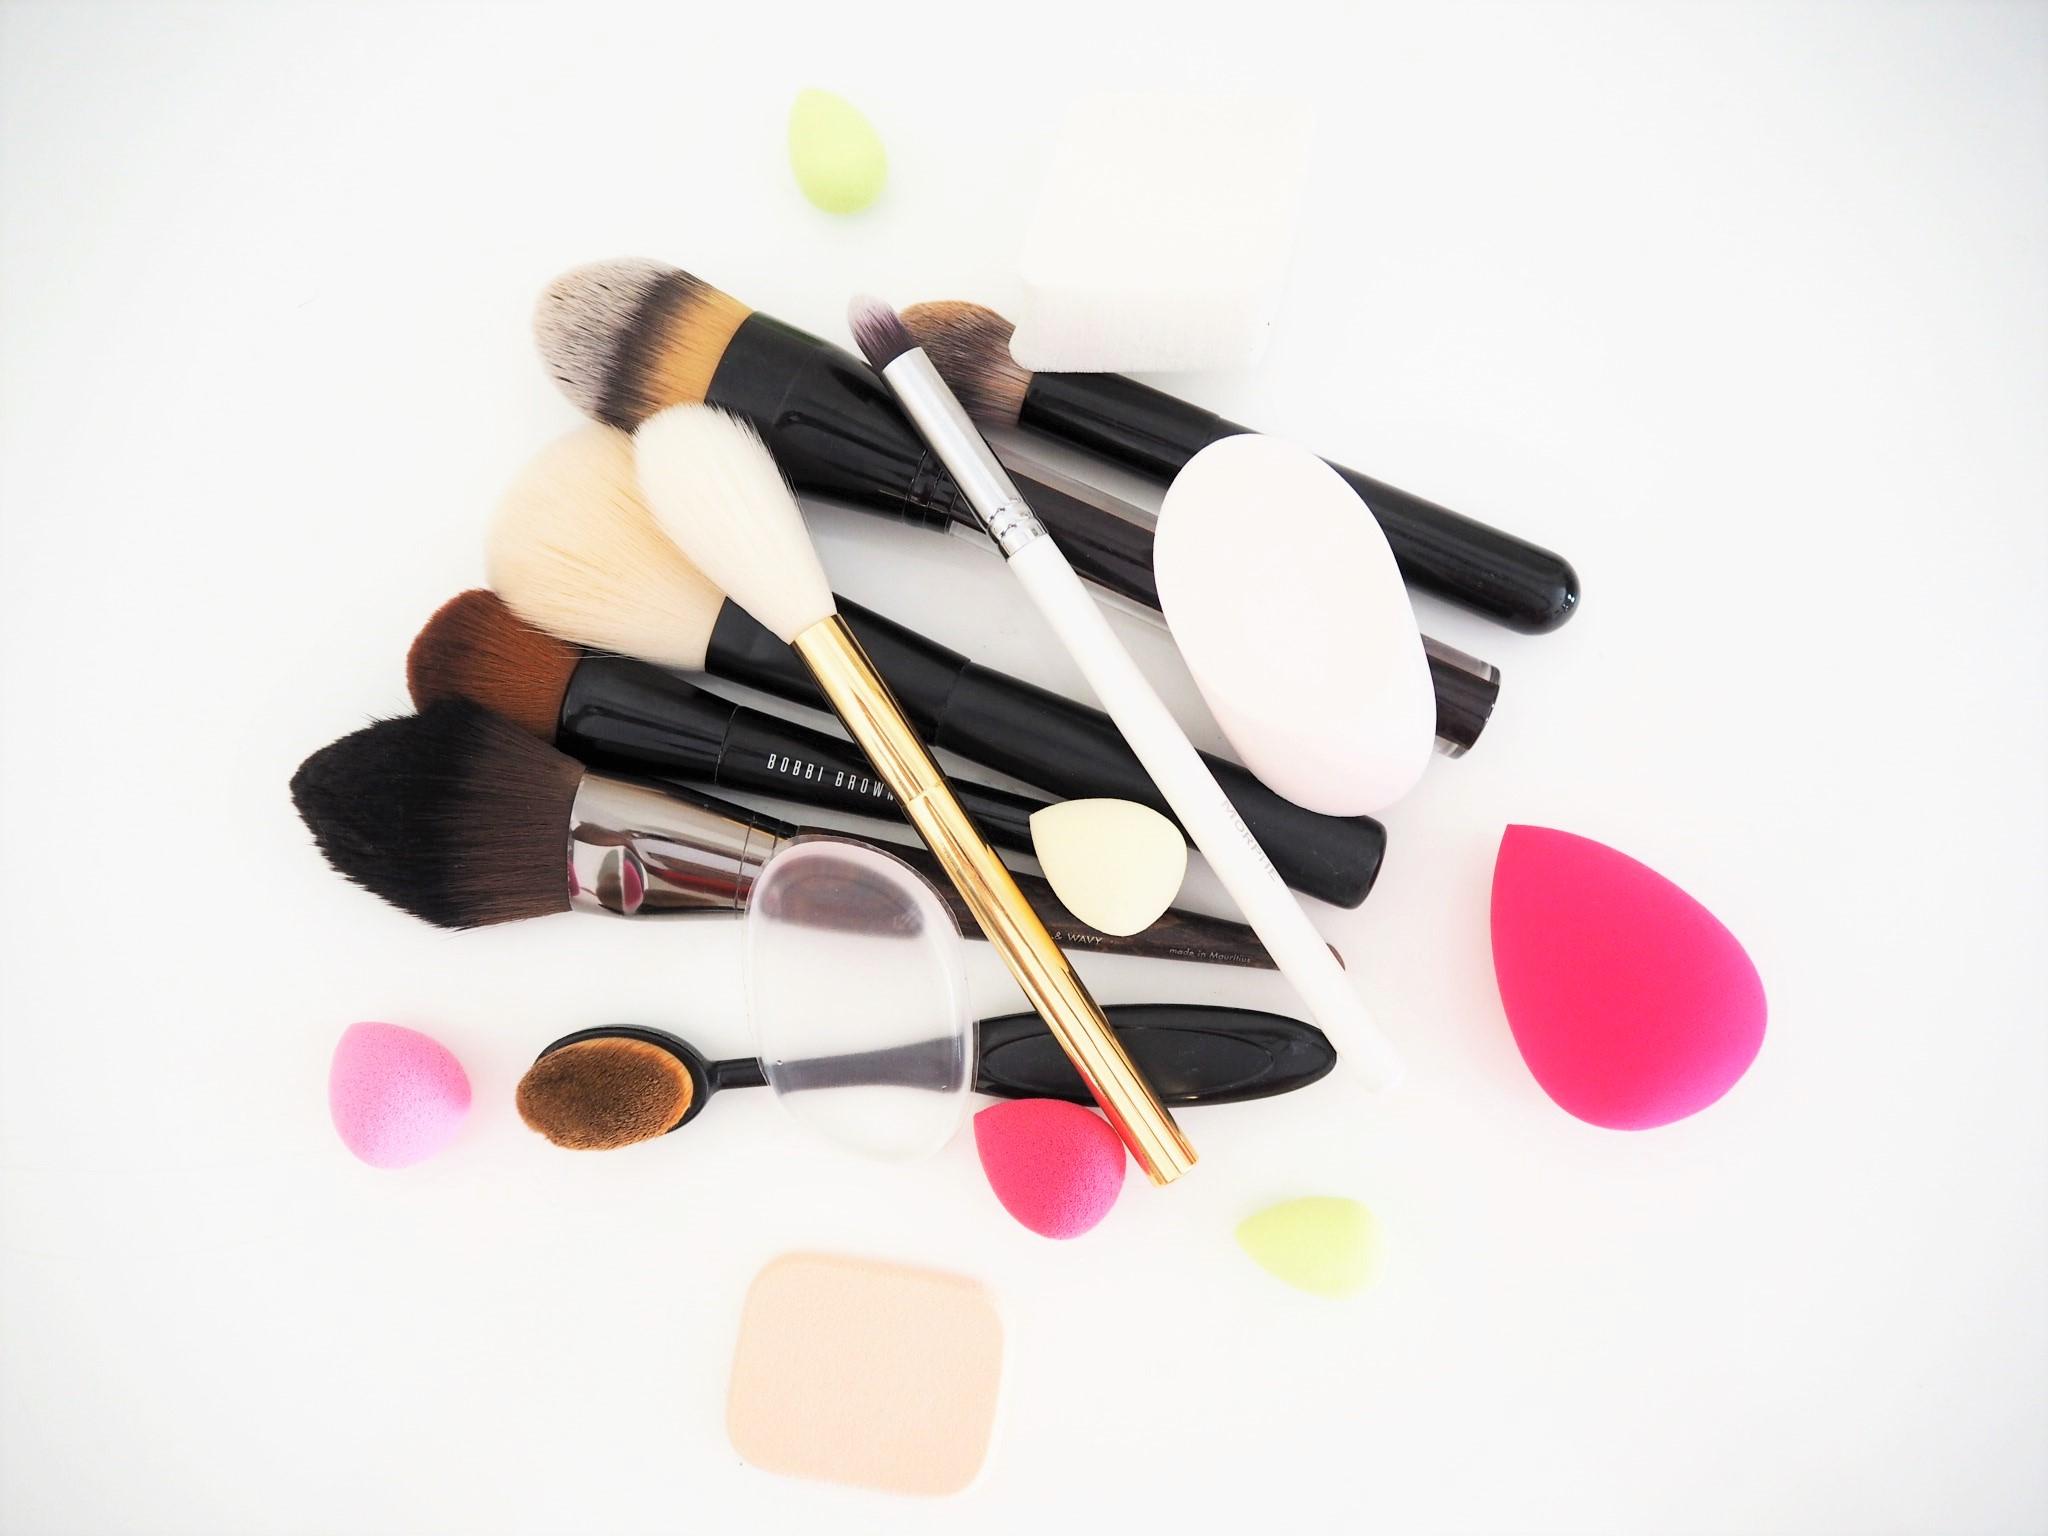 Makeupbrushestop.jpg